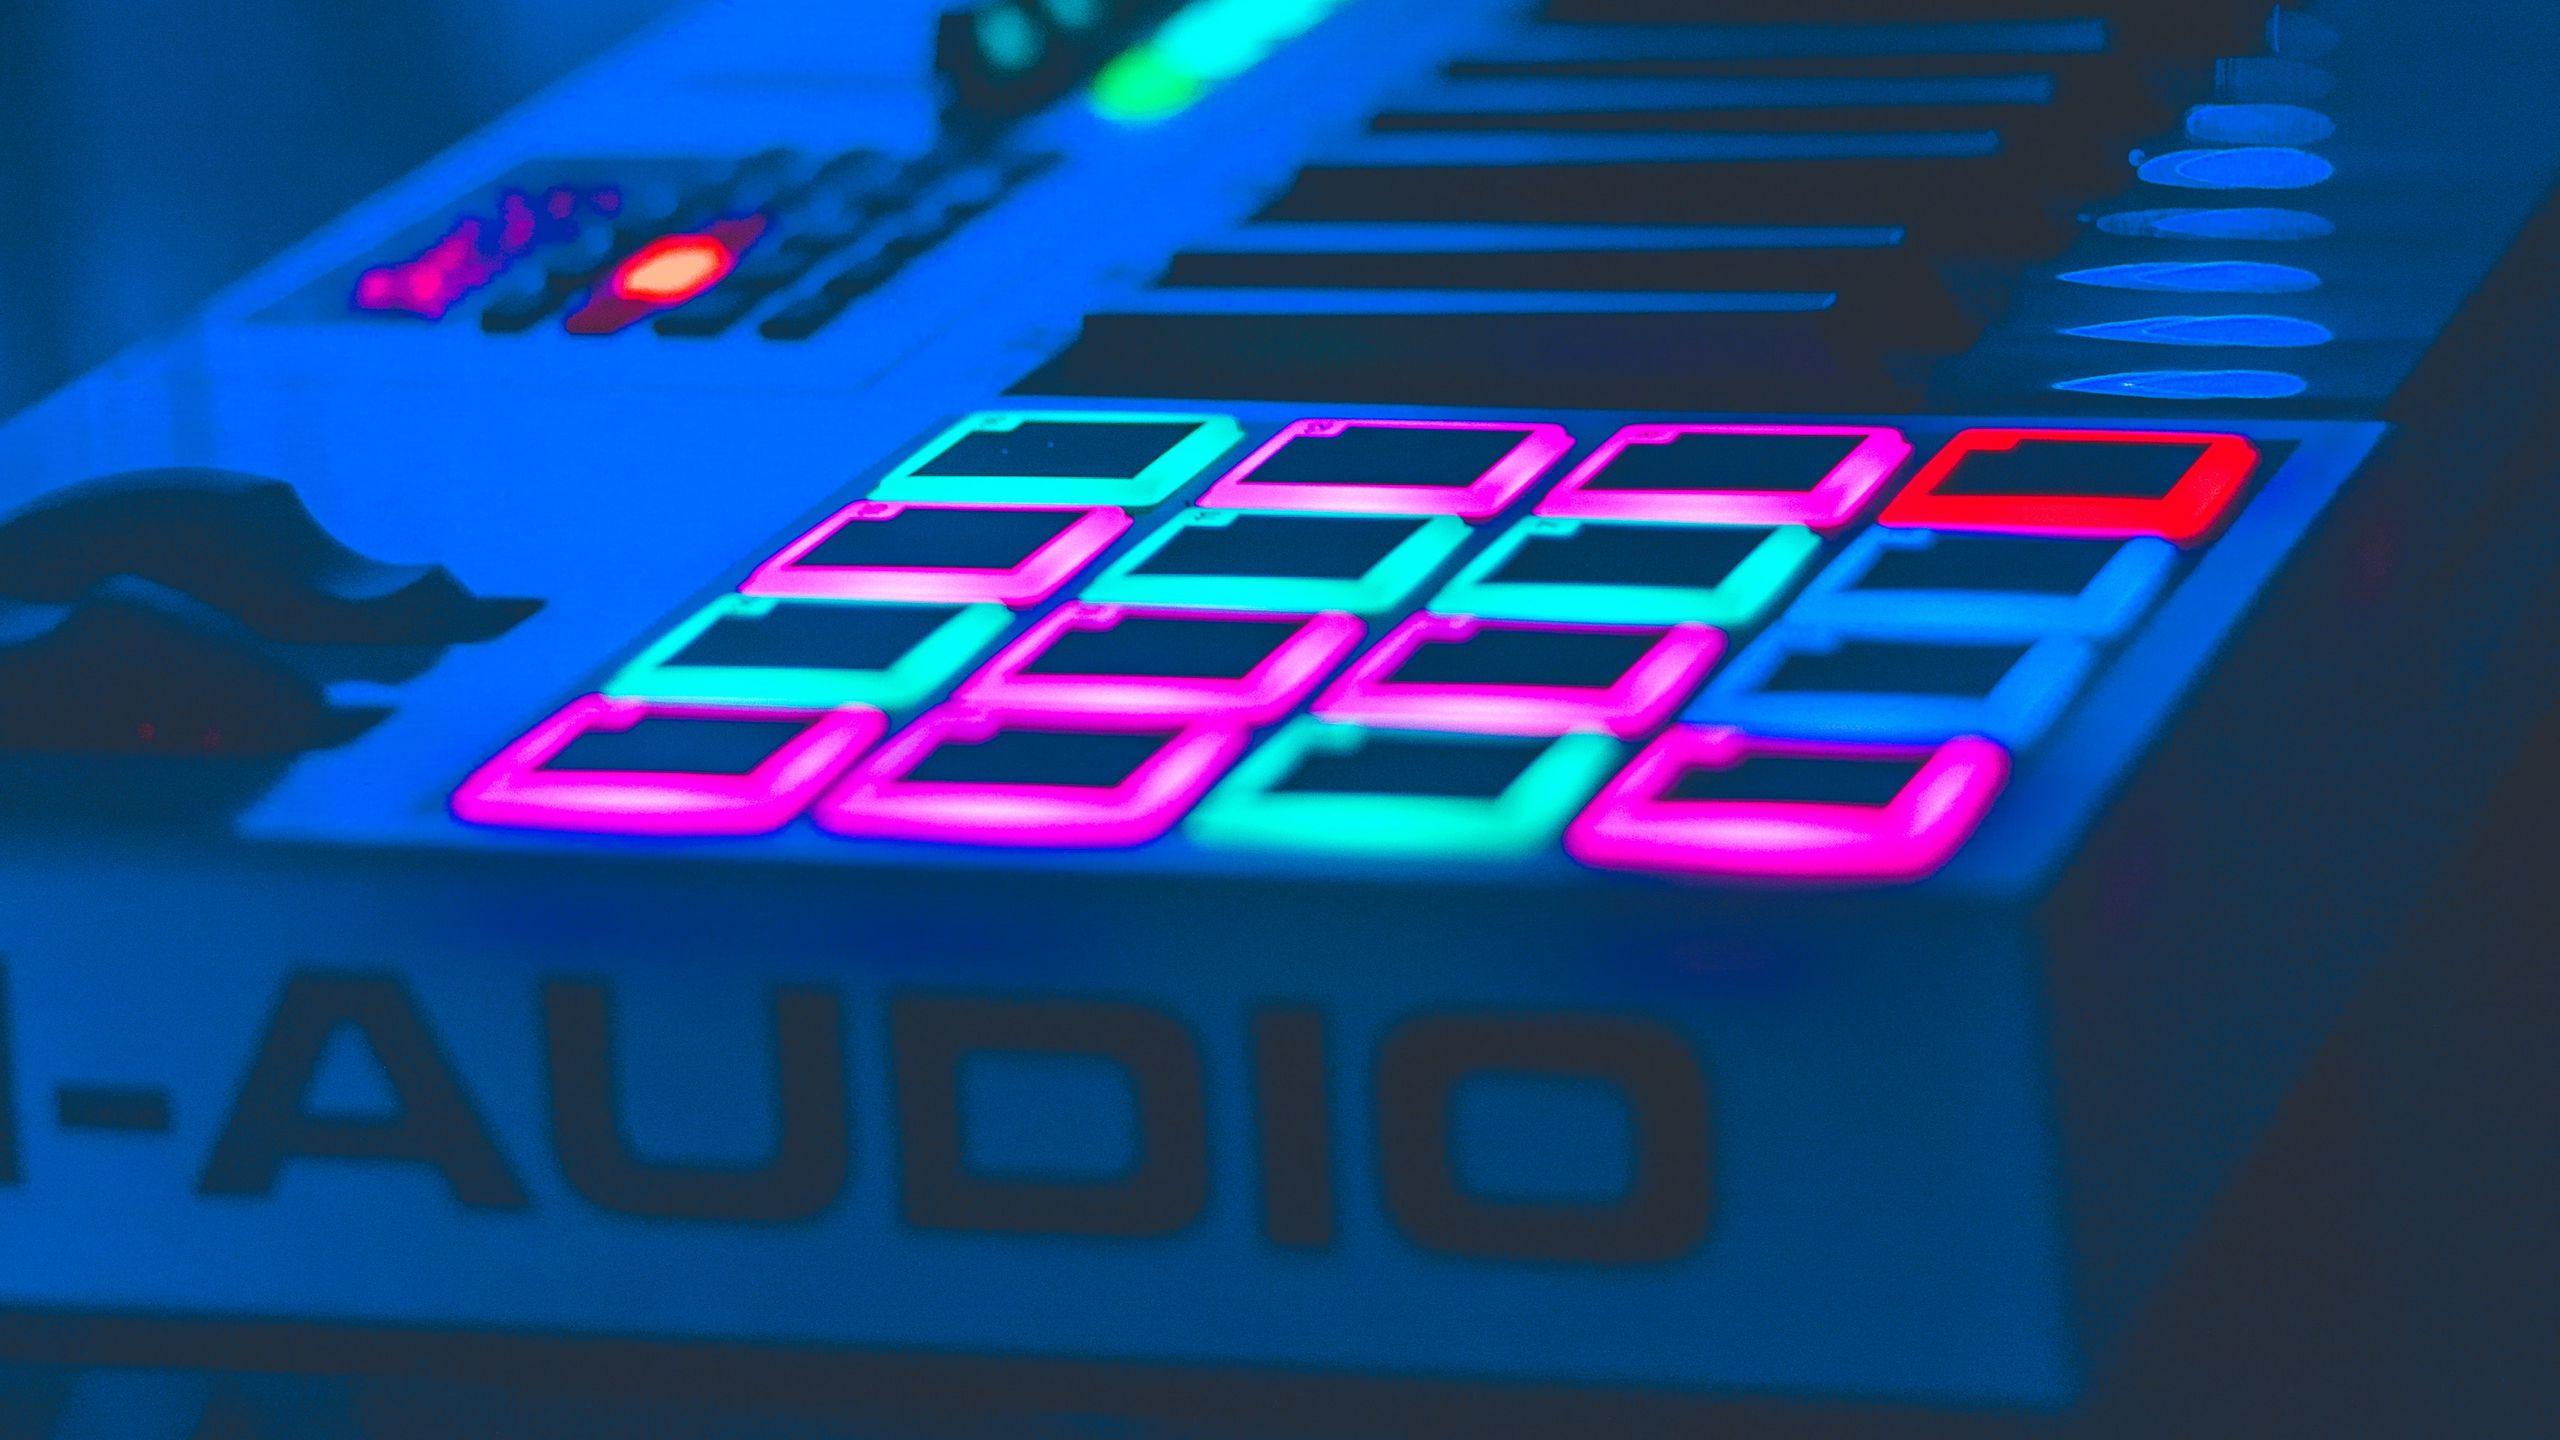 2560x1440 Wallpaper neon, key, instrumental, audio